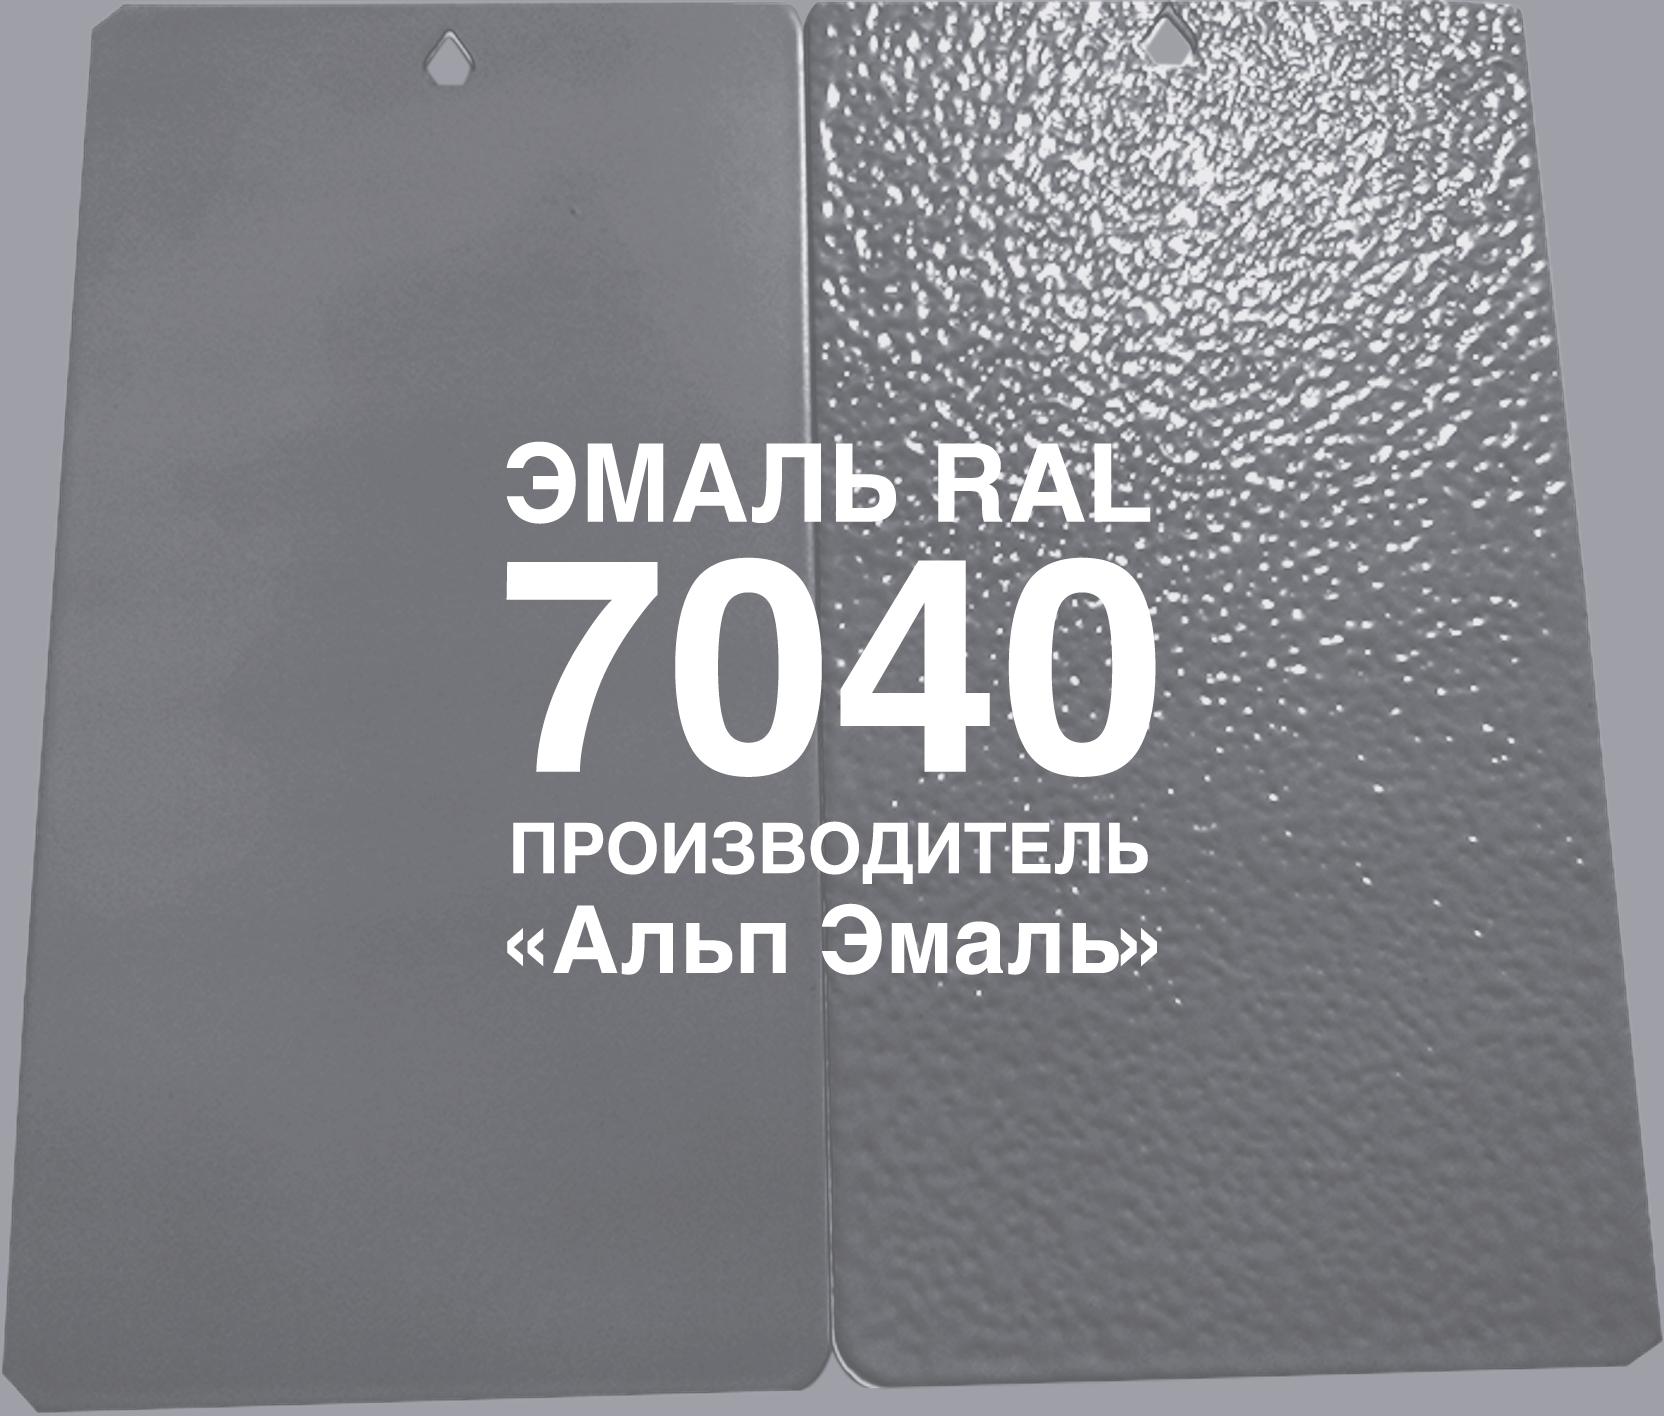 Краска эмаль RAL 7040 серая ЗАО Альп Эмаль